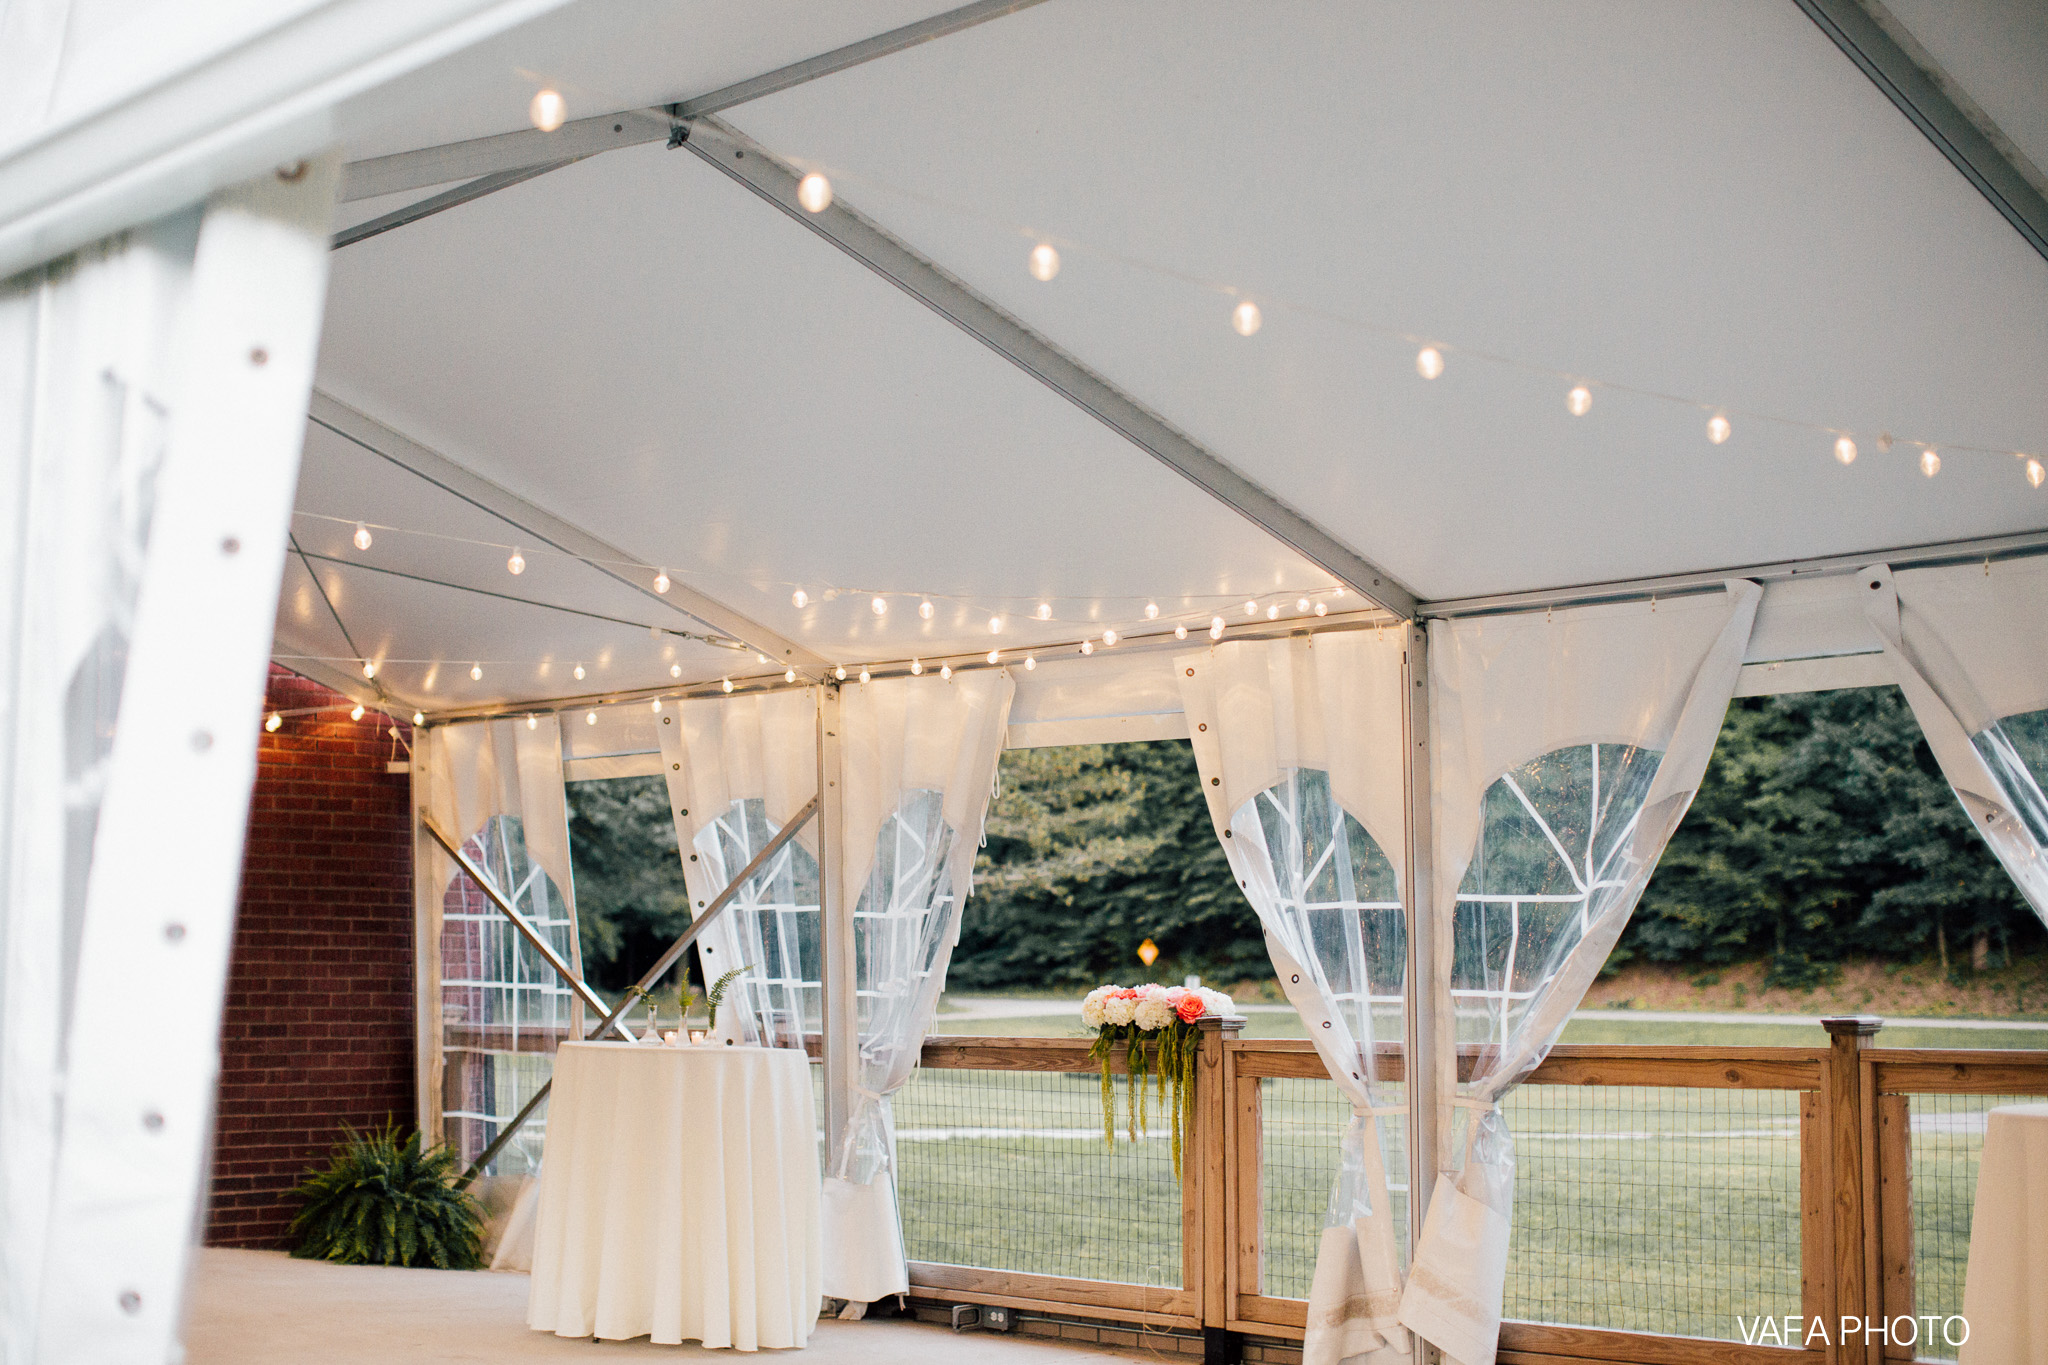 The-Felt-Estate-Wedding-Kailie-David-Vafa-Photo-857.jpg